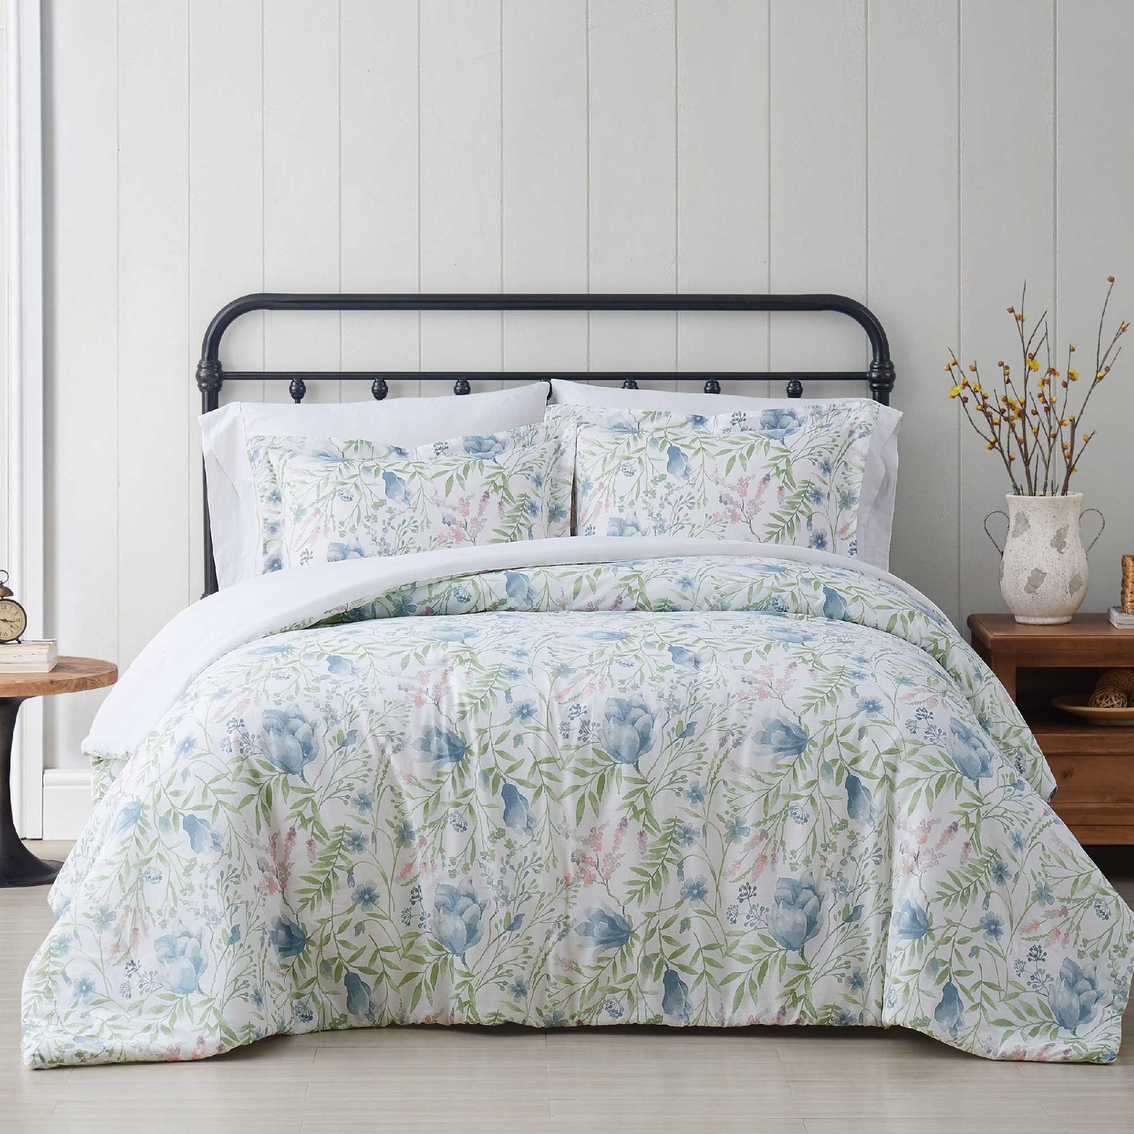 Cottage Classics Field Floral Comforter Set Bedding Sets Household Shop The Exchange